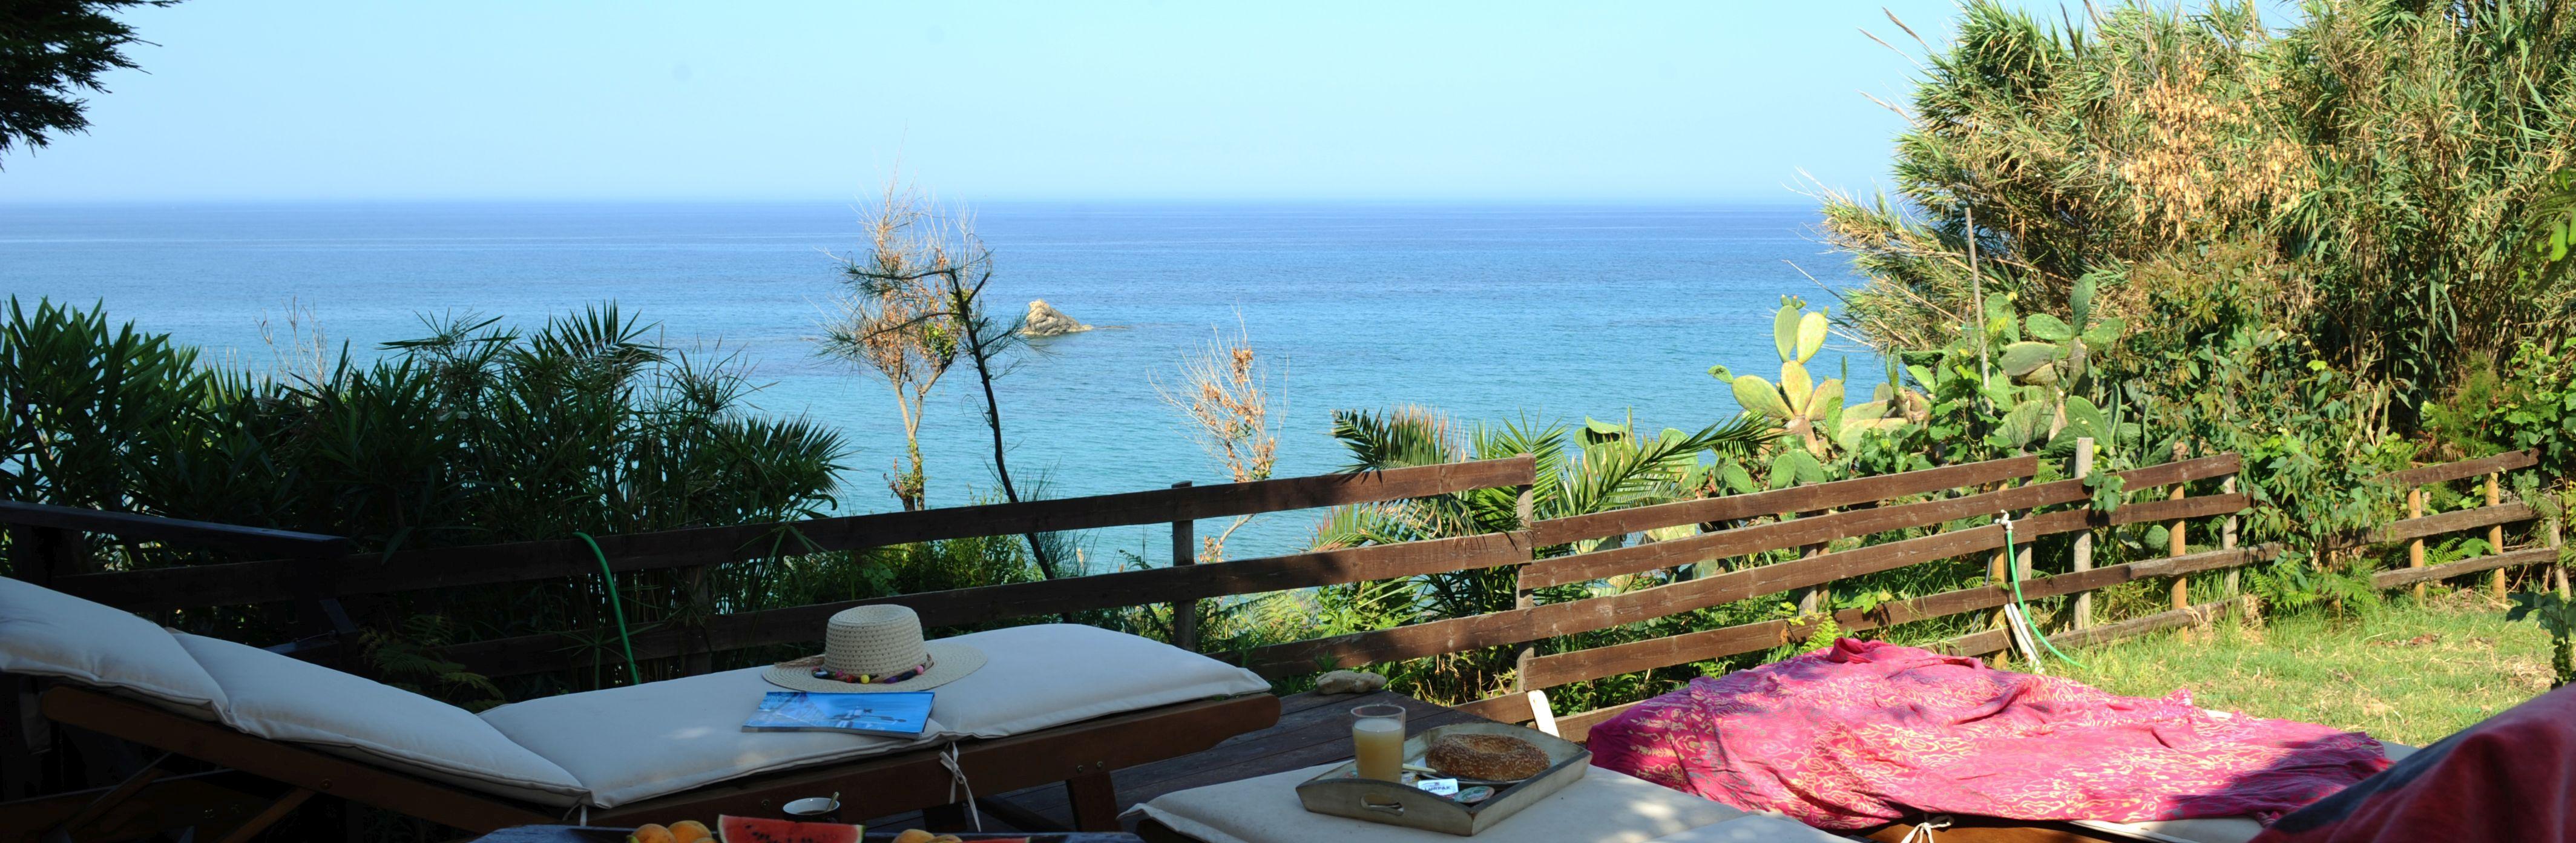 Relaxen - Korfu Strandvilla Meliti, Kanouli, Agios Matheos, Korfu, KorfuCorfu